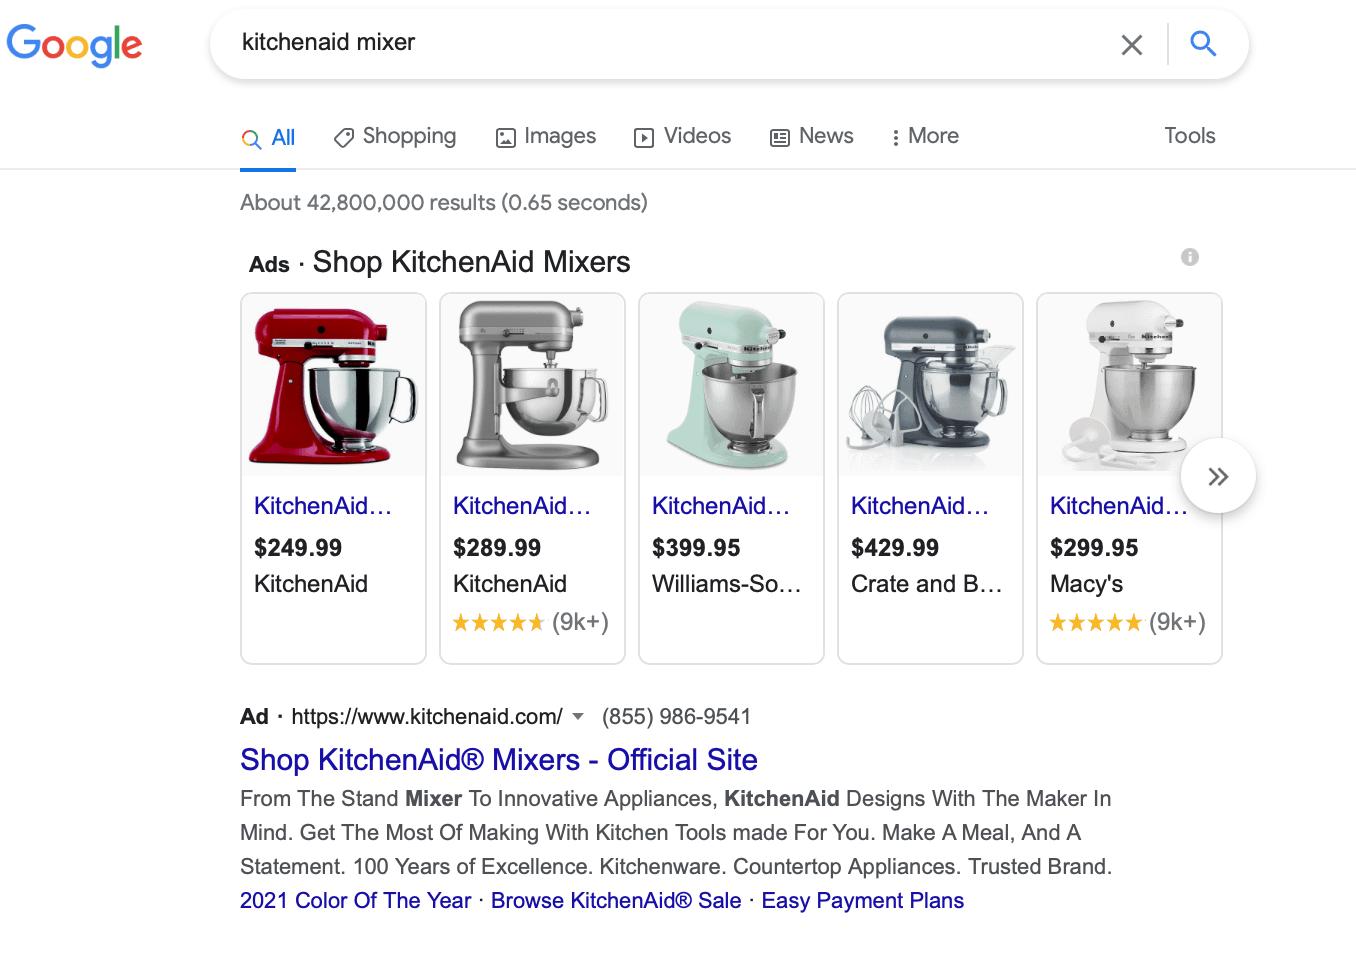 KitchenAid bidding on a product keyword